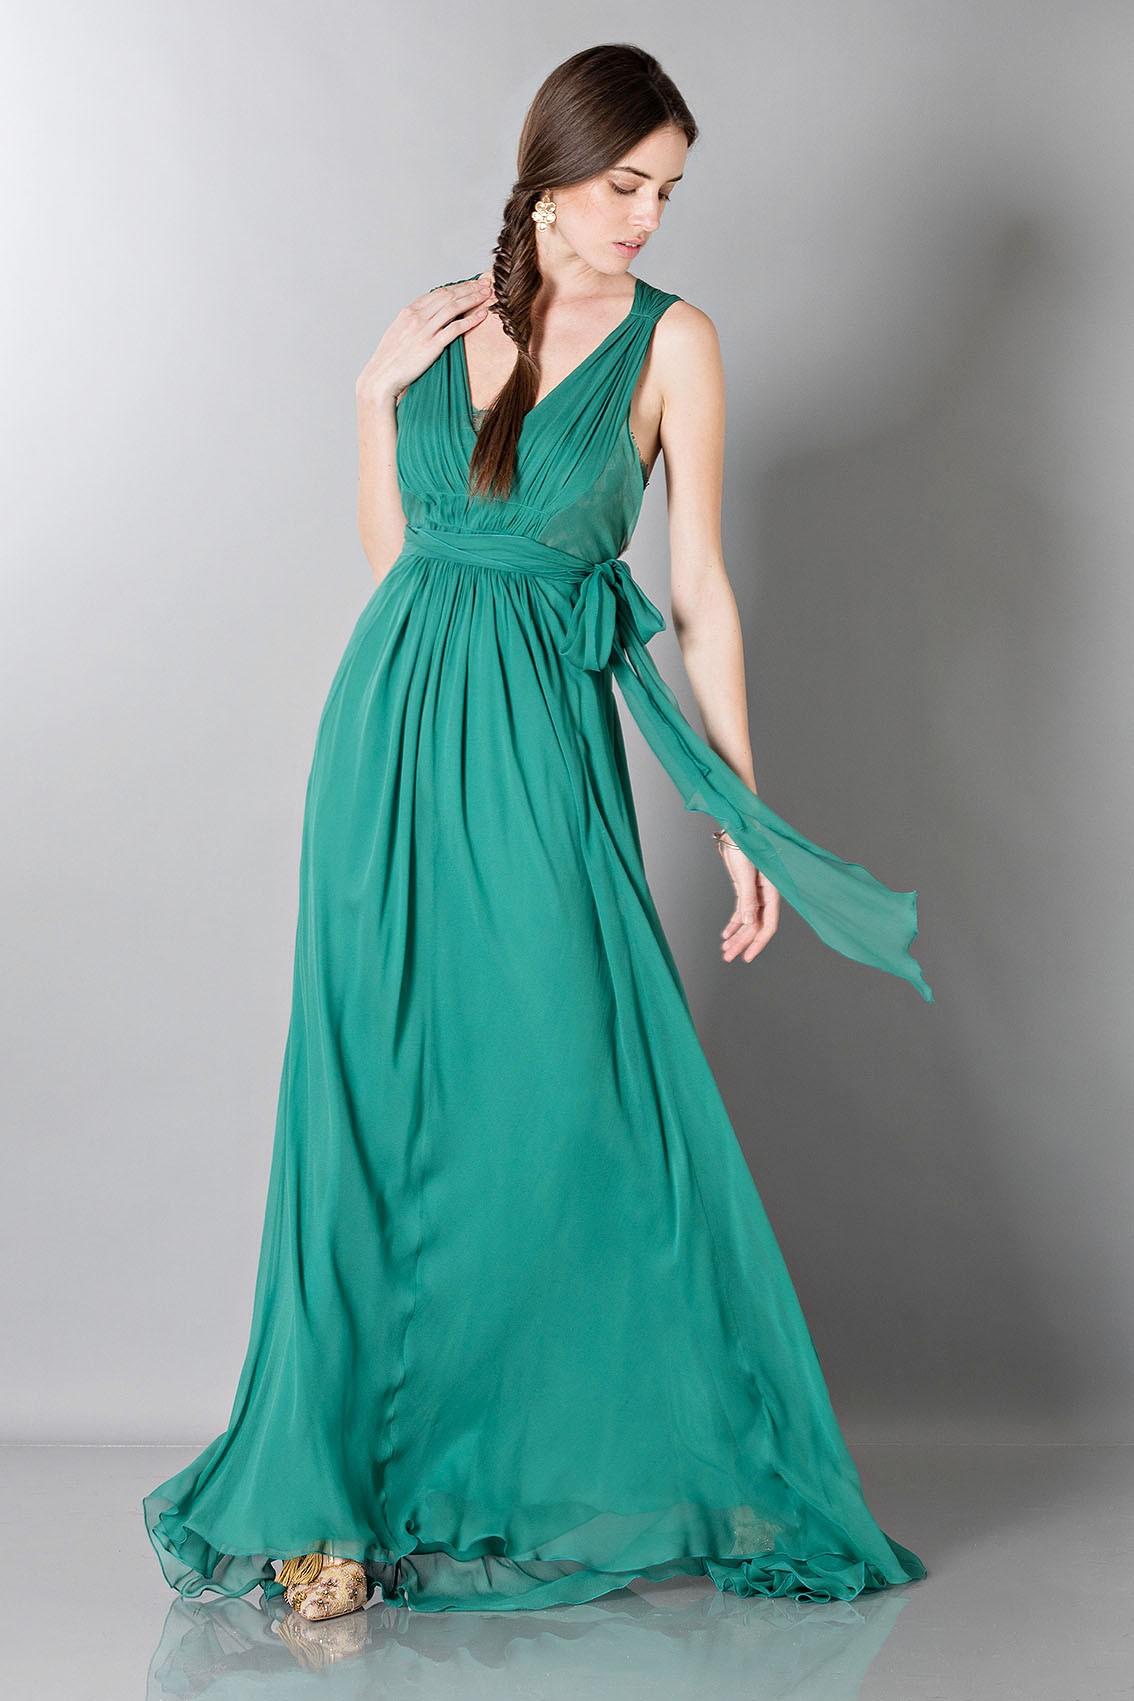 Drexcode - Alberta Ferretti Empire-inspired silk dress | Rent luxury ...